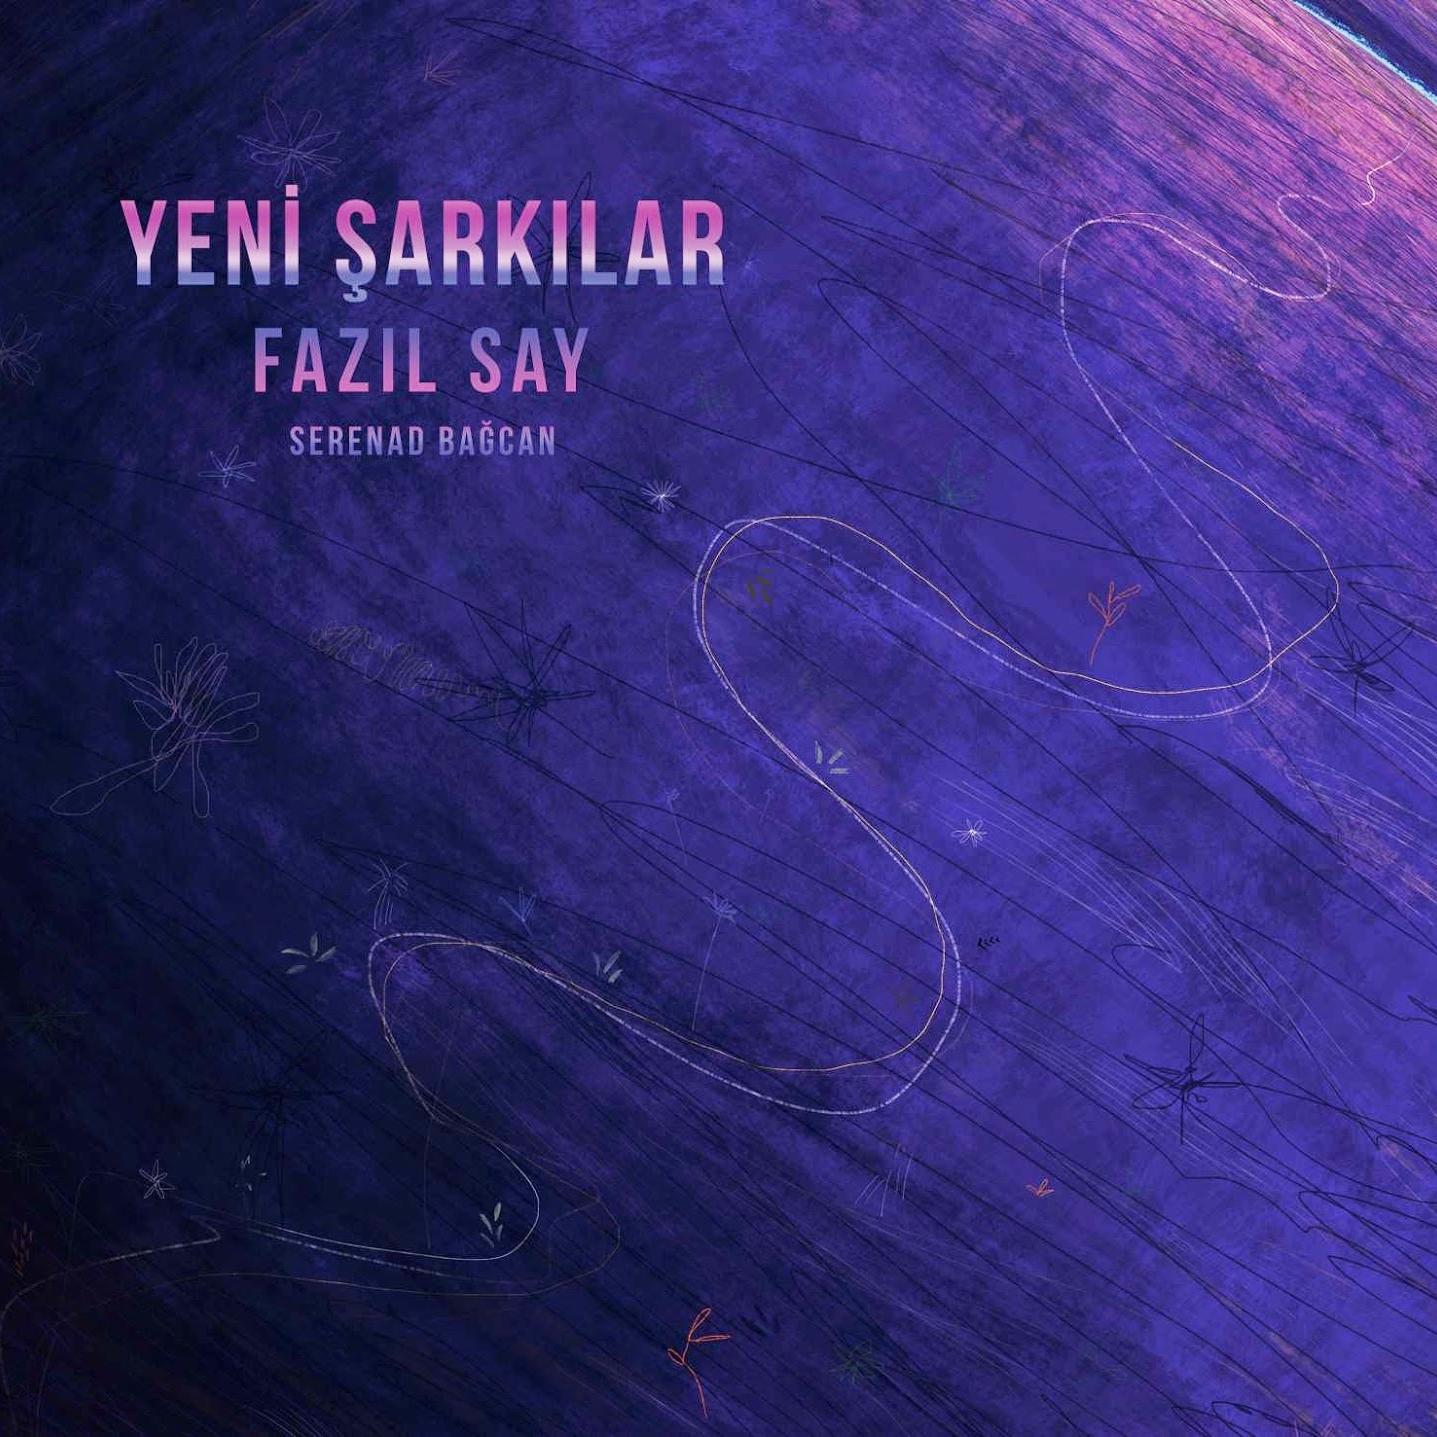 YENI SARKILAR  (2015) CD: Track 1, 2 und 4 ©Ada Music